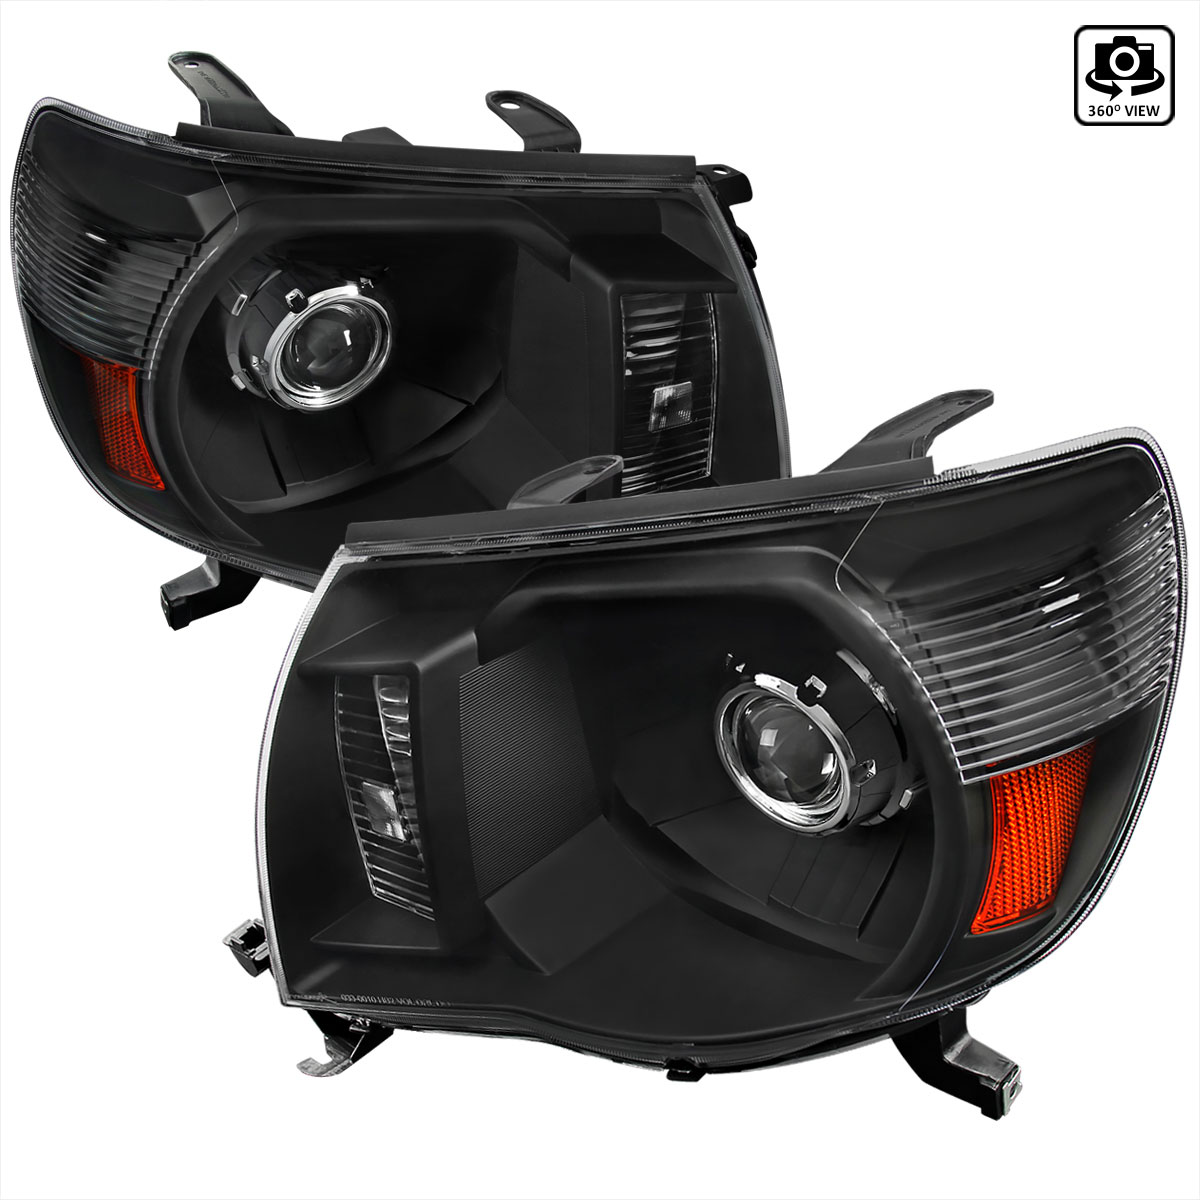 2007 Tacoma Headlights >> Spec-D Tuning (2LHP-TAC06JM-RS) Toyota Tacoma Projector Headlight Black Housing, 05-11